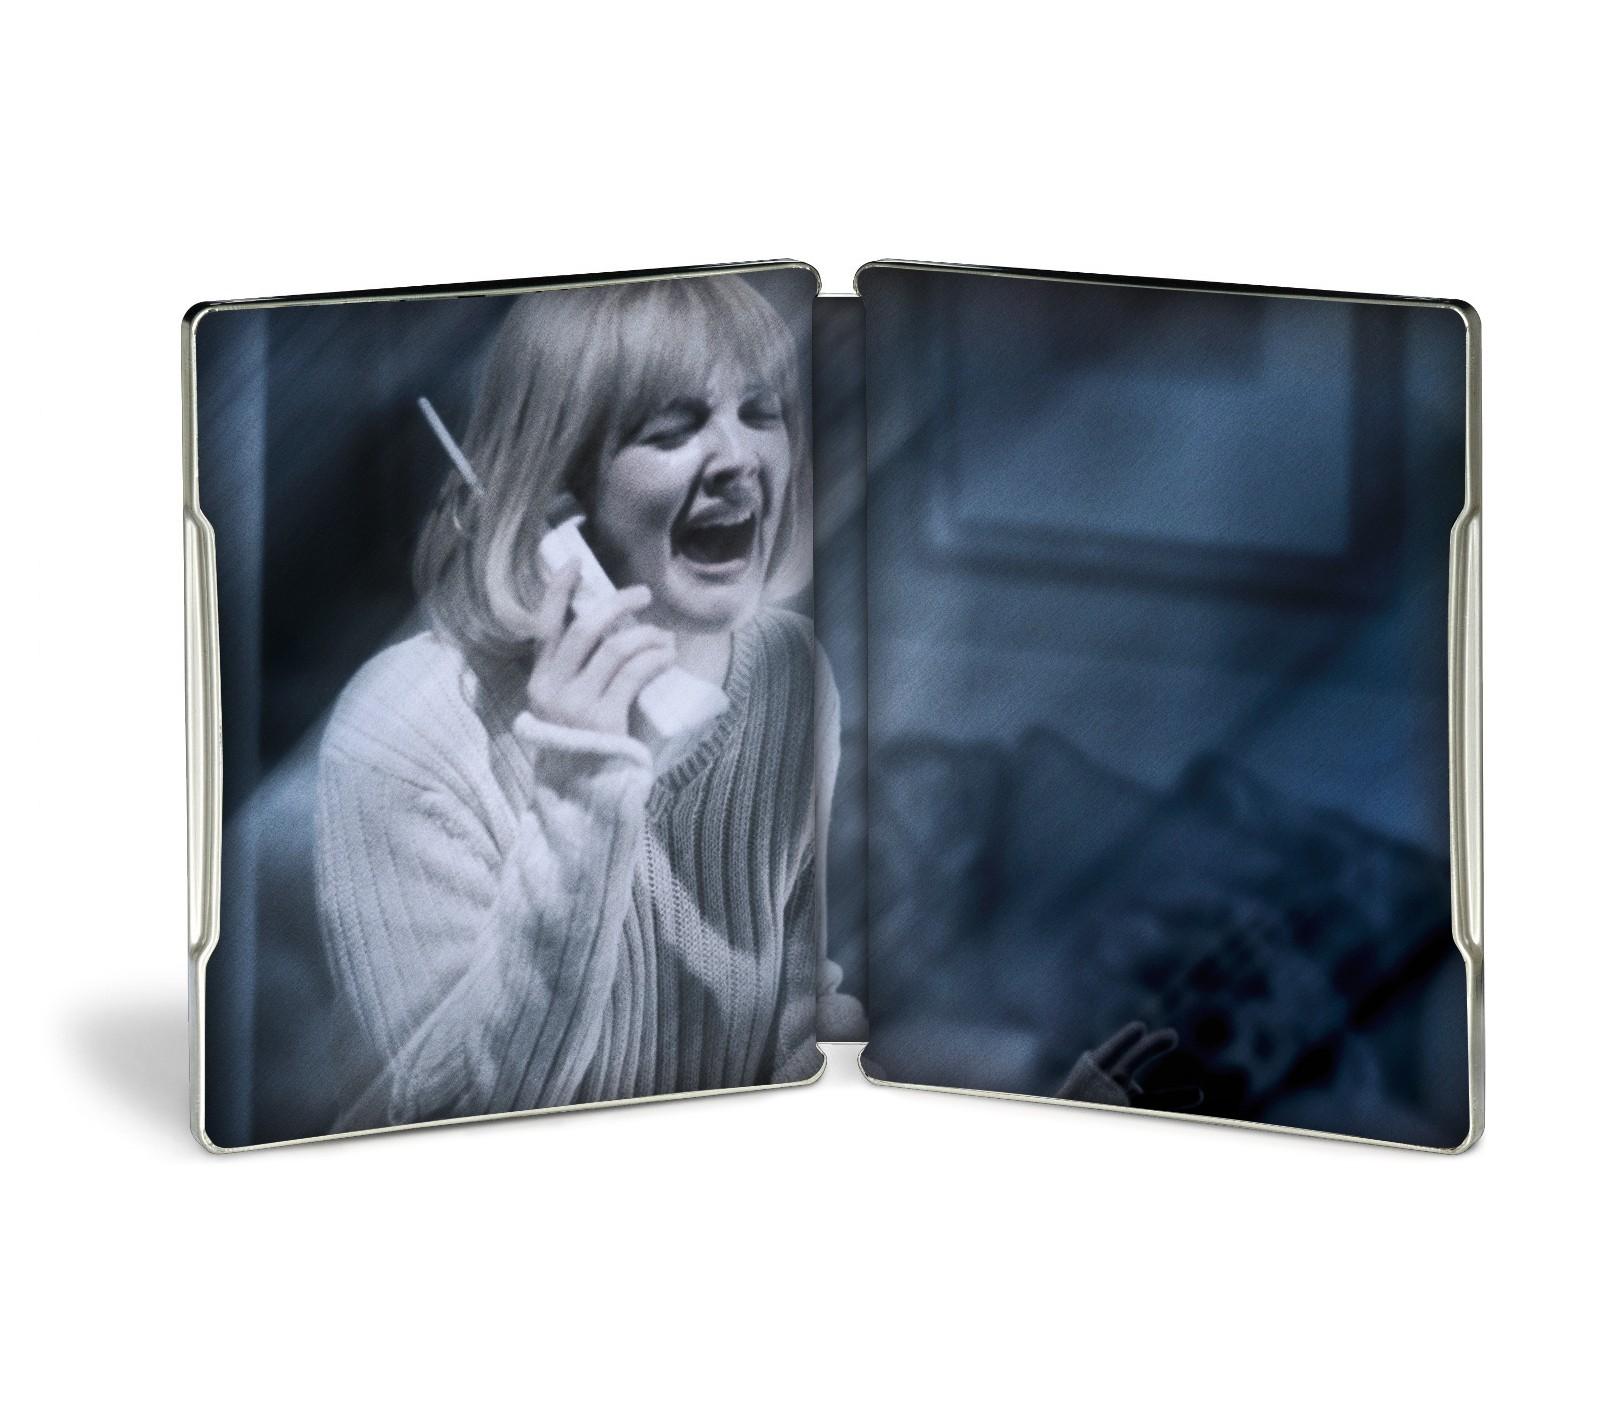 SCREAM - BRD UHD 4K STEELBOOK EDITION LIMITEE